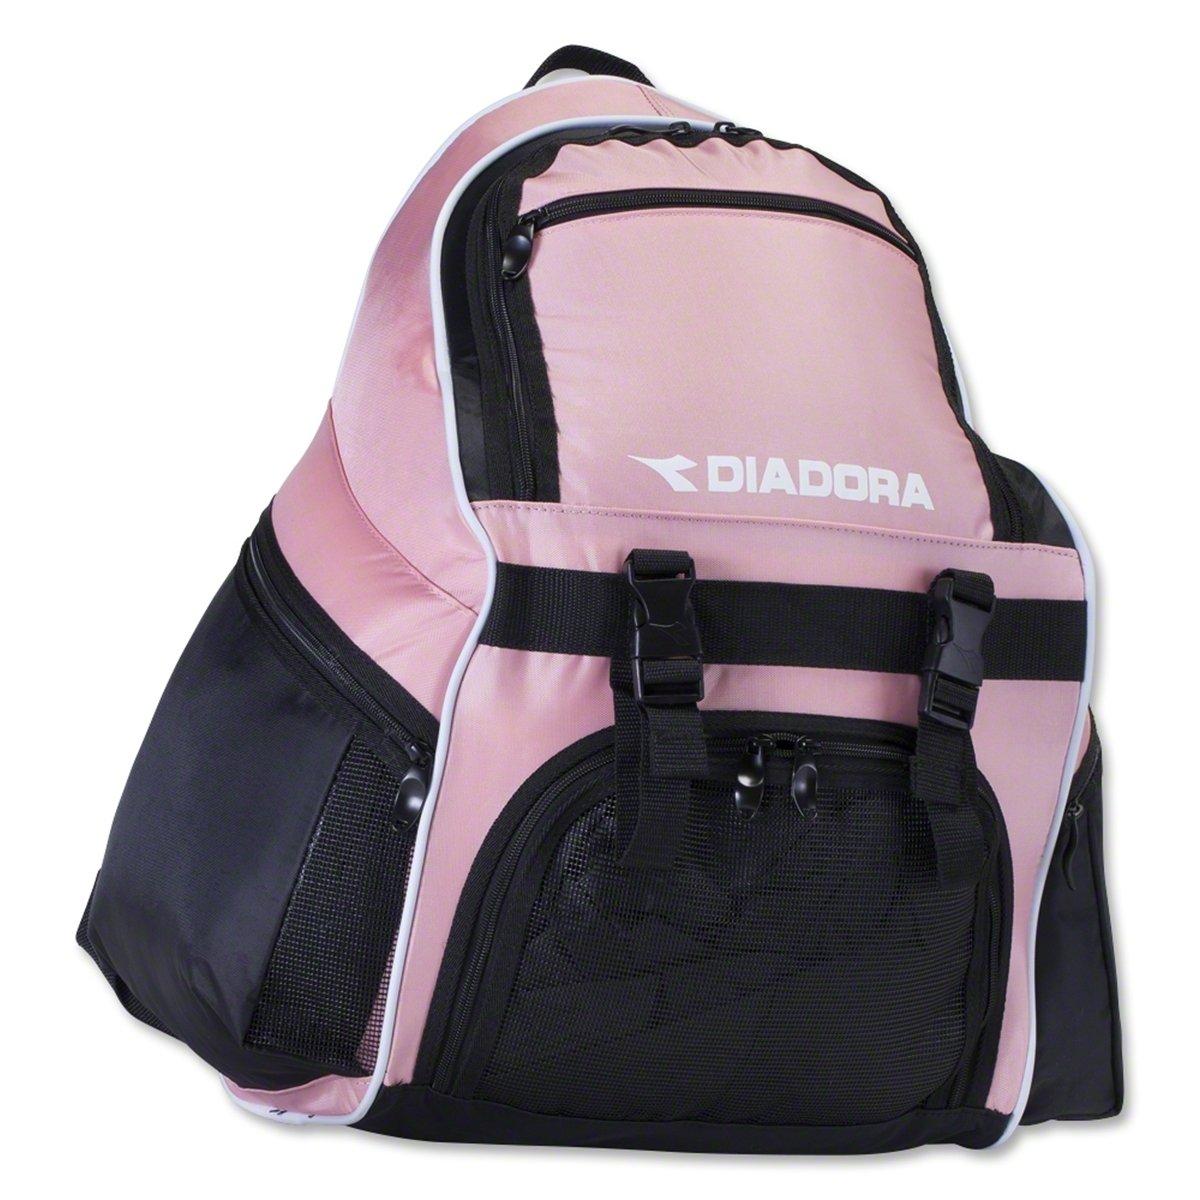 Diadora Squadra バックパック B00783L32G ピンク